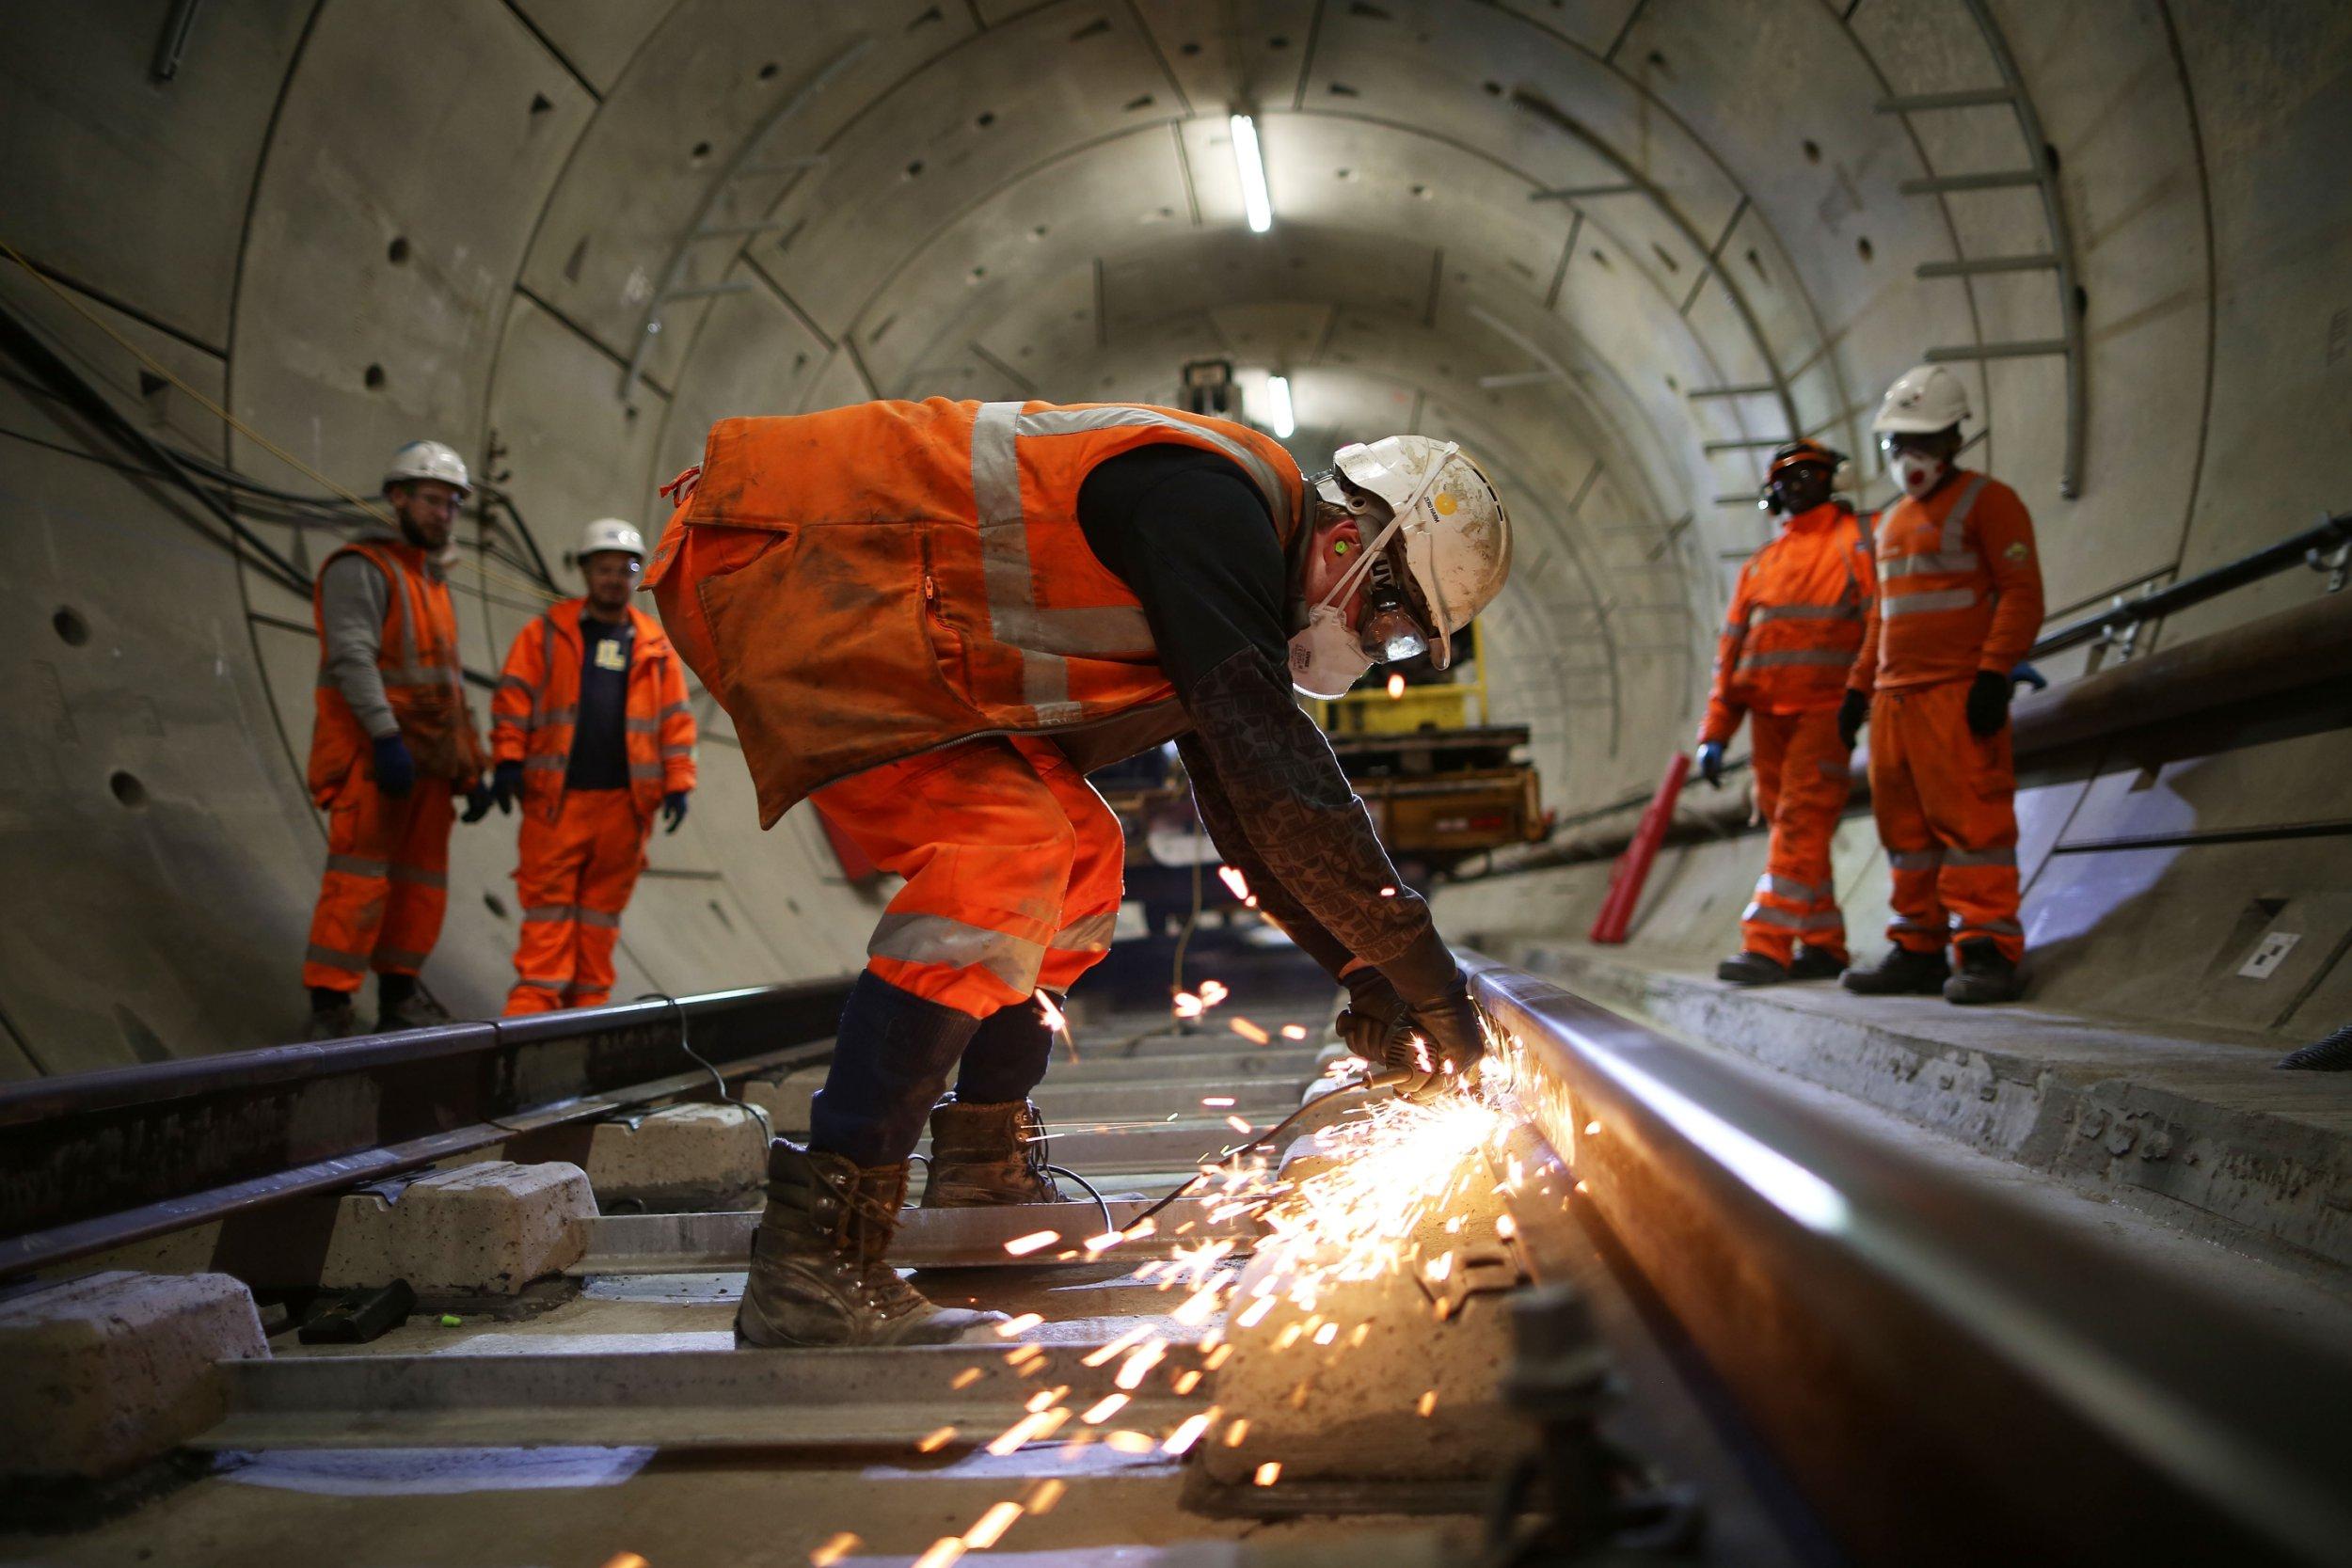 Crossrail might not open until 2021 despite £2,800,000,000 bailout